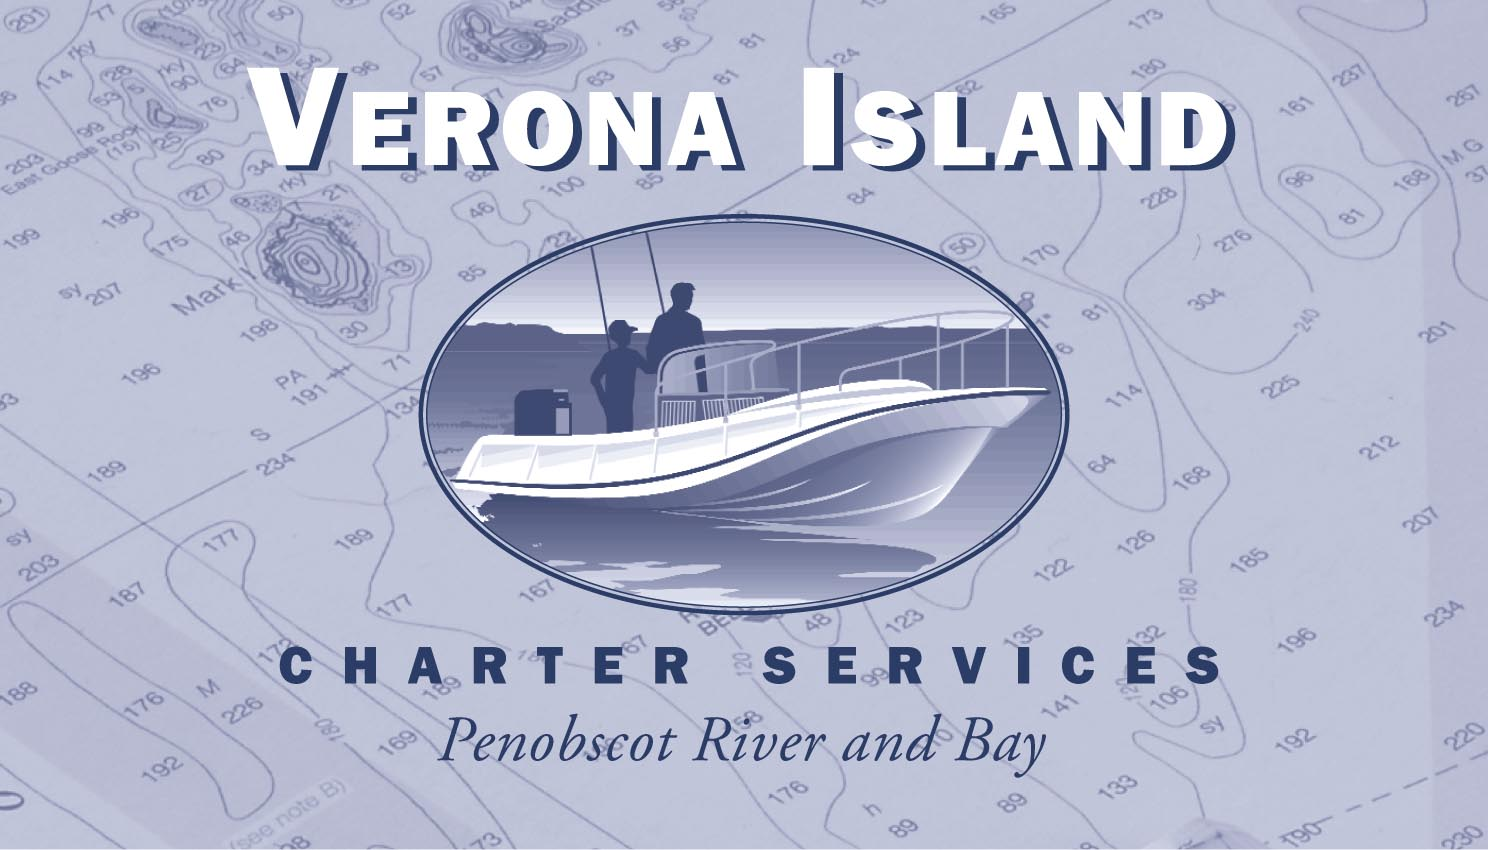 Verona Island Charter Services